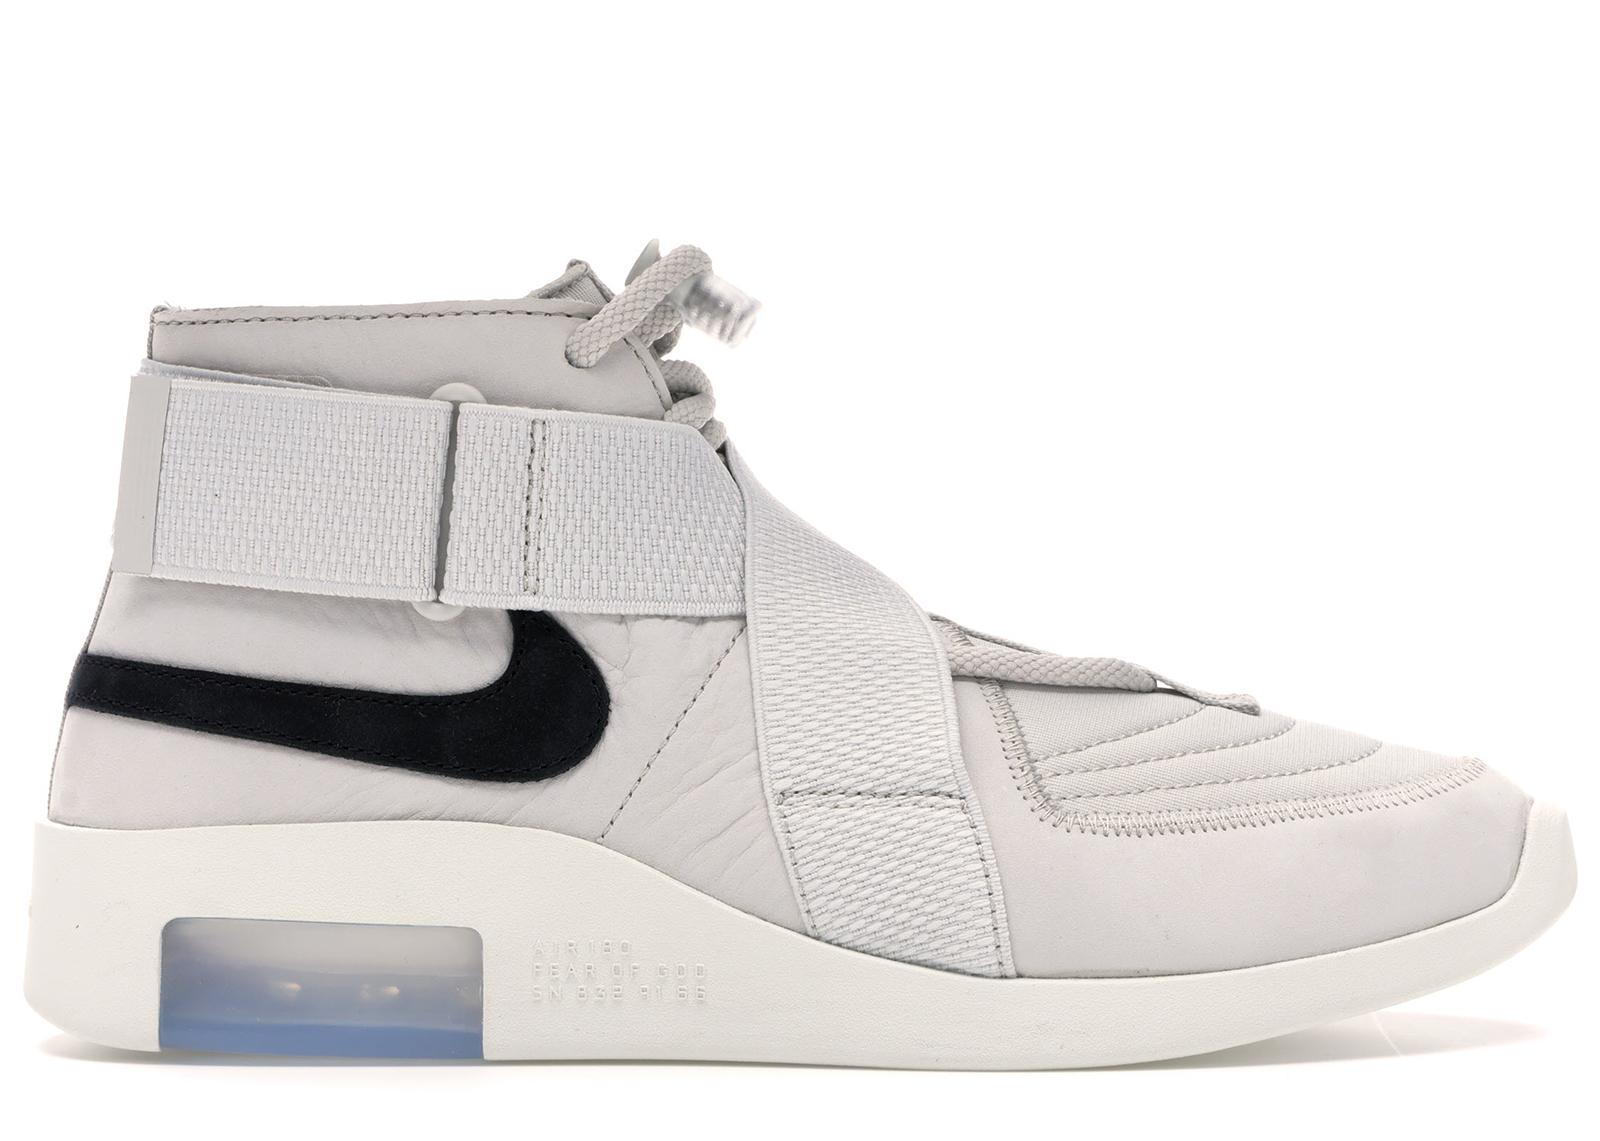 Nike Air Fear of God Raid Light Bone